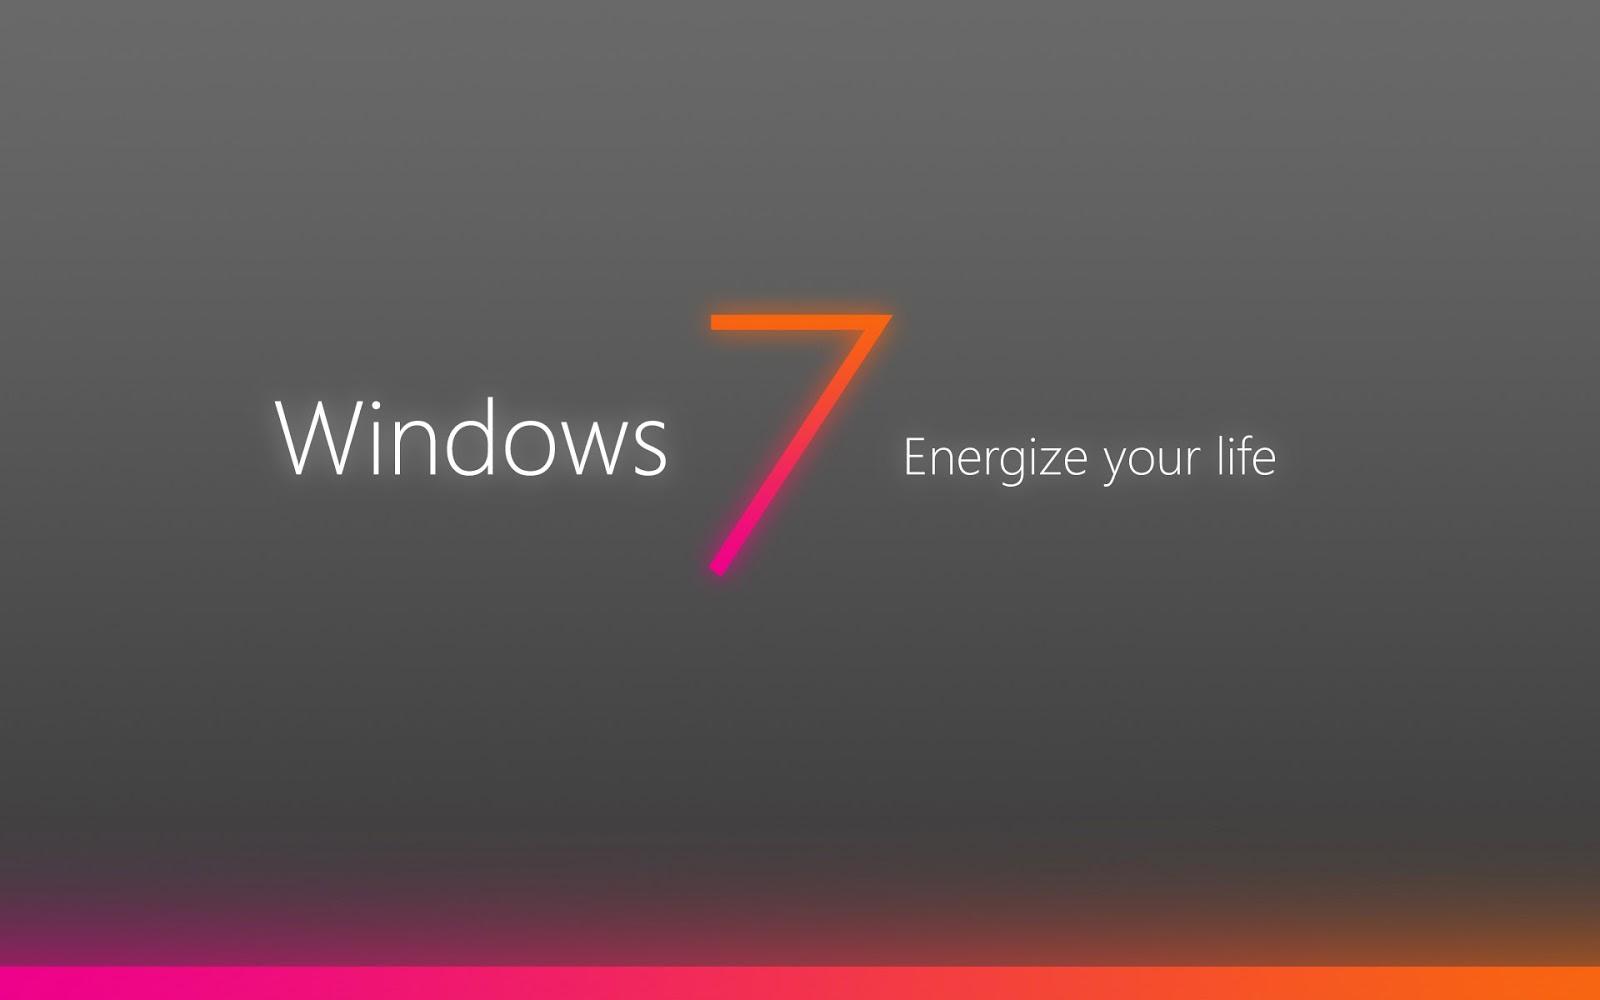 Windows 7 Full Hd Wallpapers